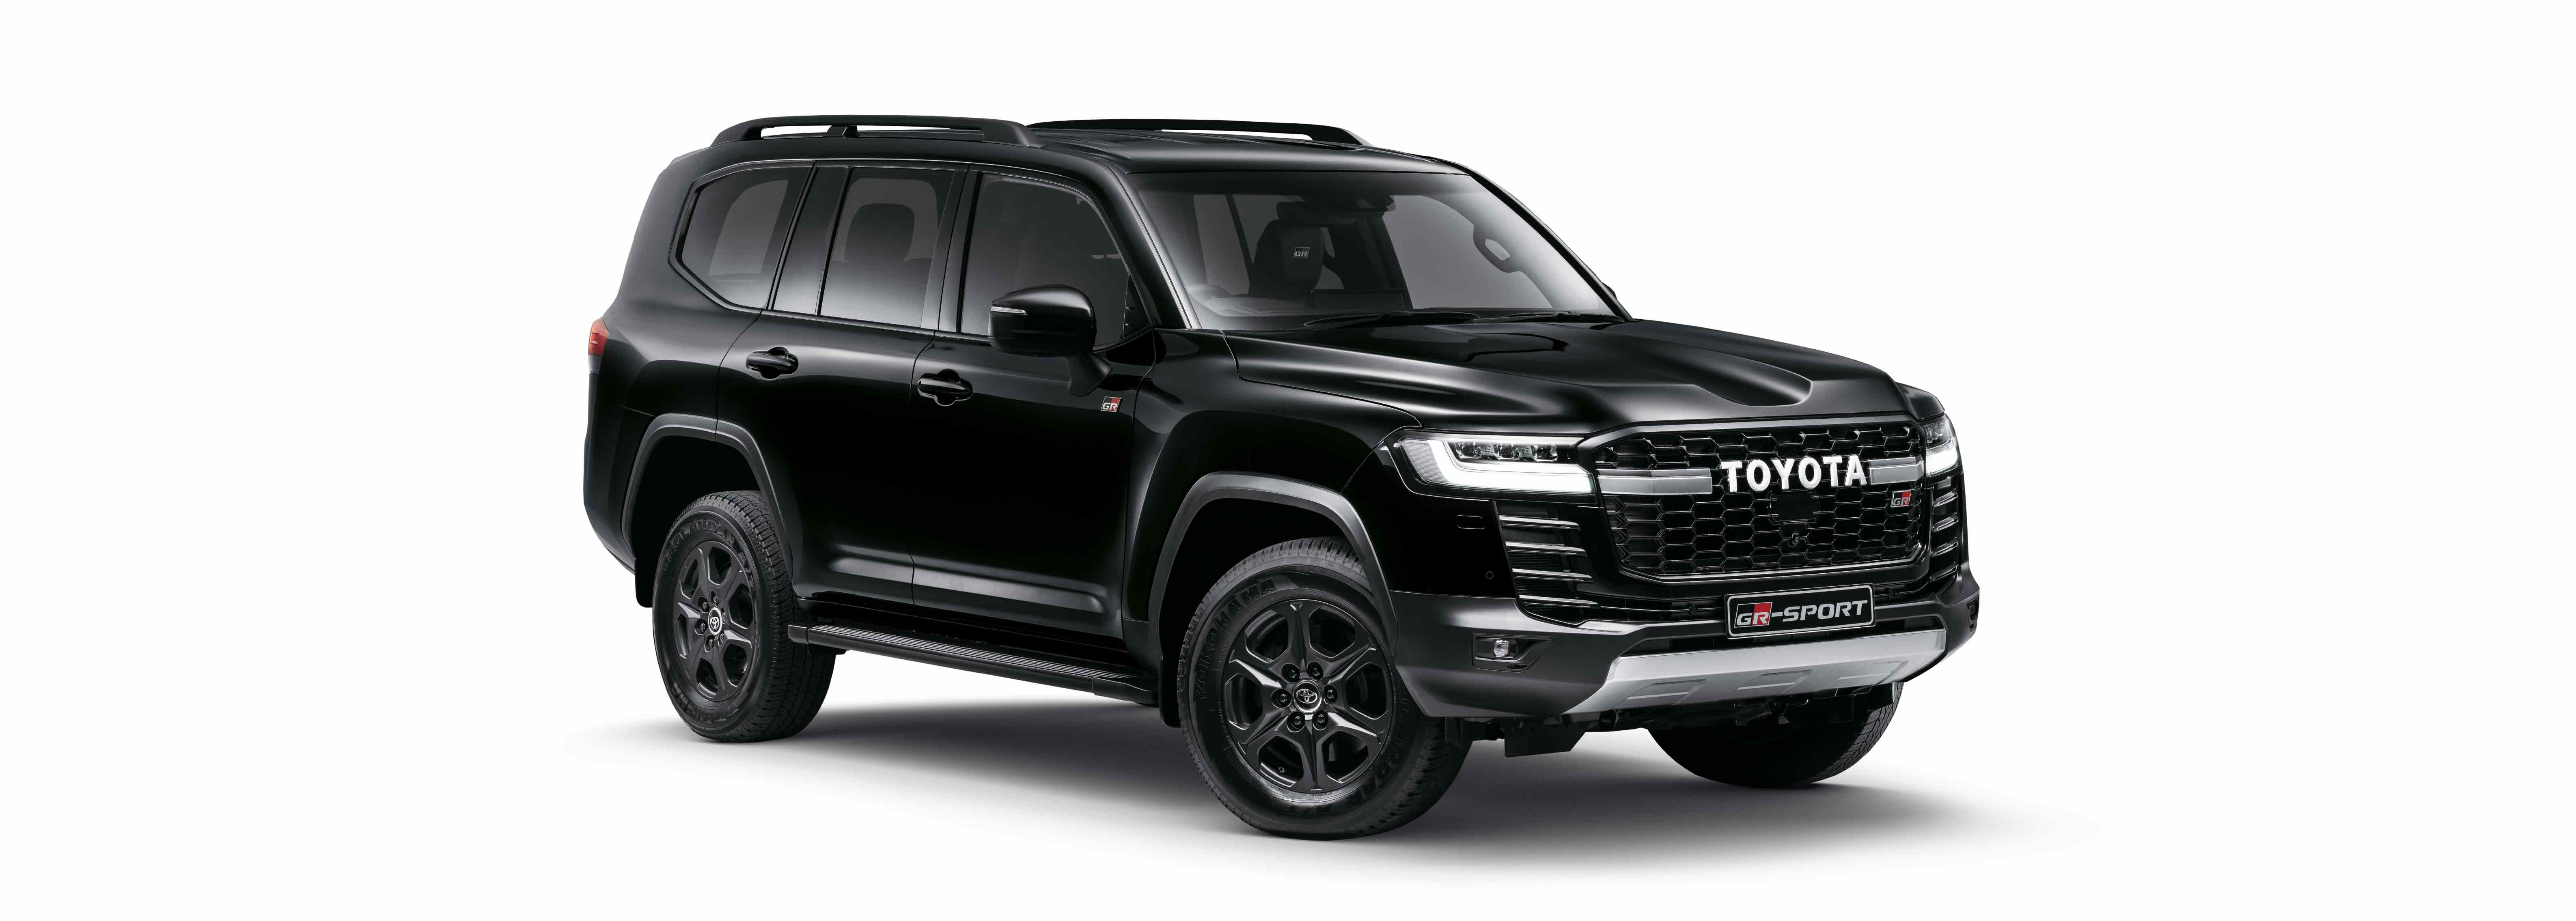 Toyota Land Cruiser 300 to go on sale soon